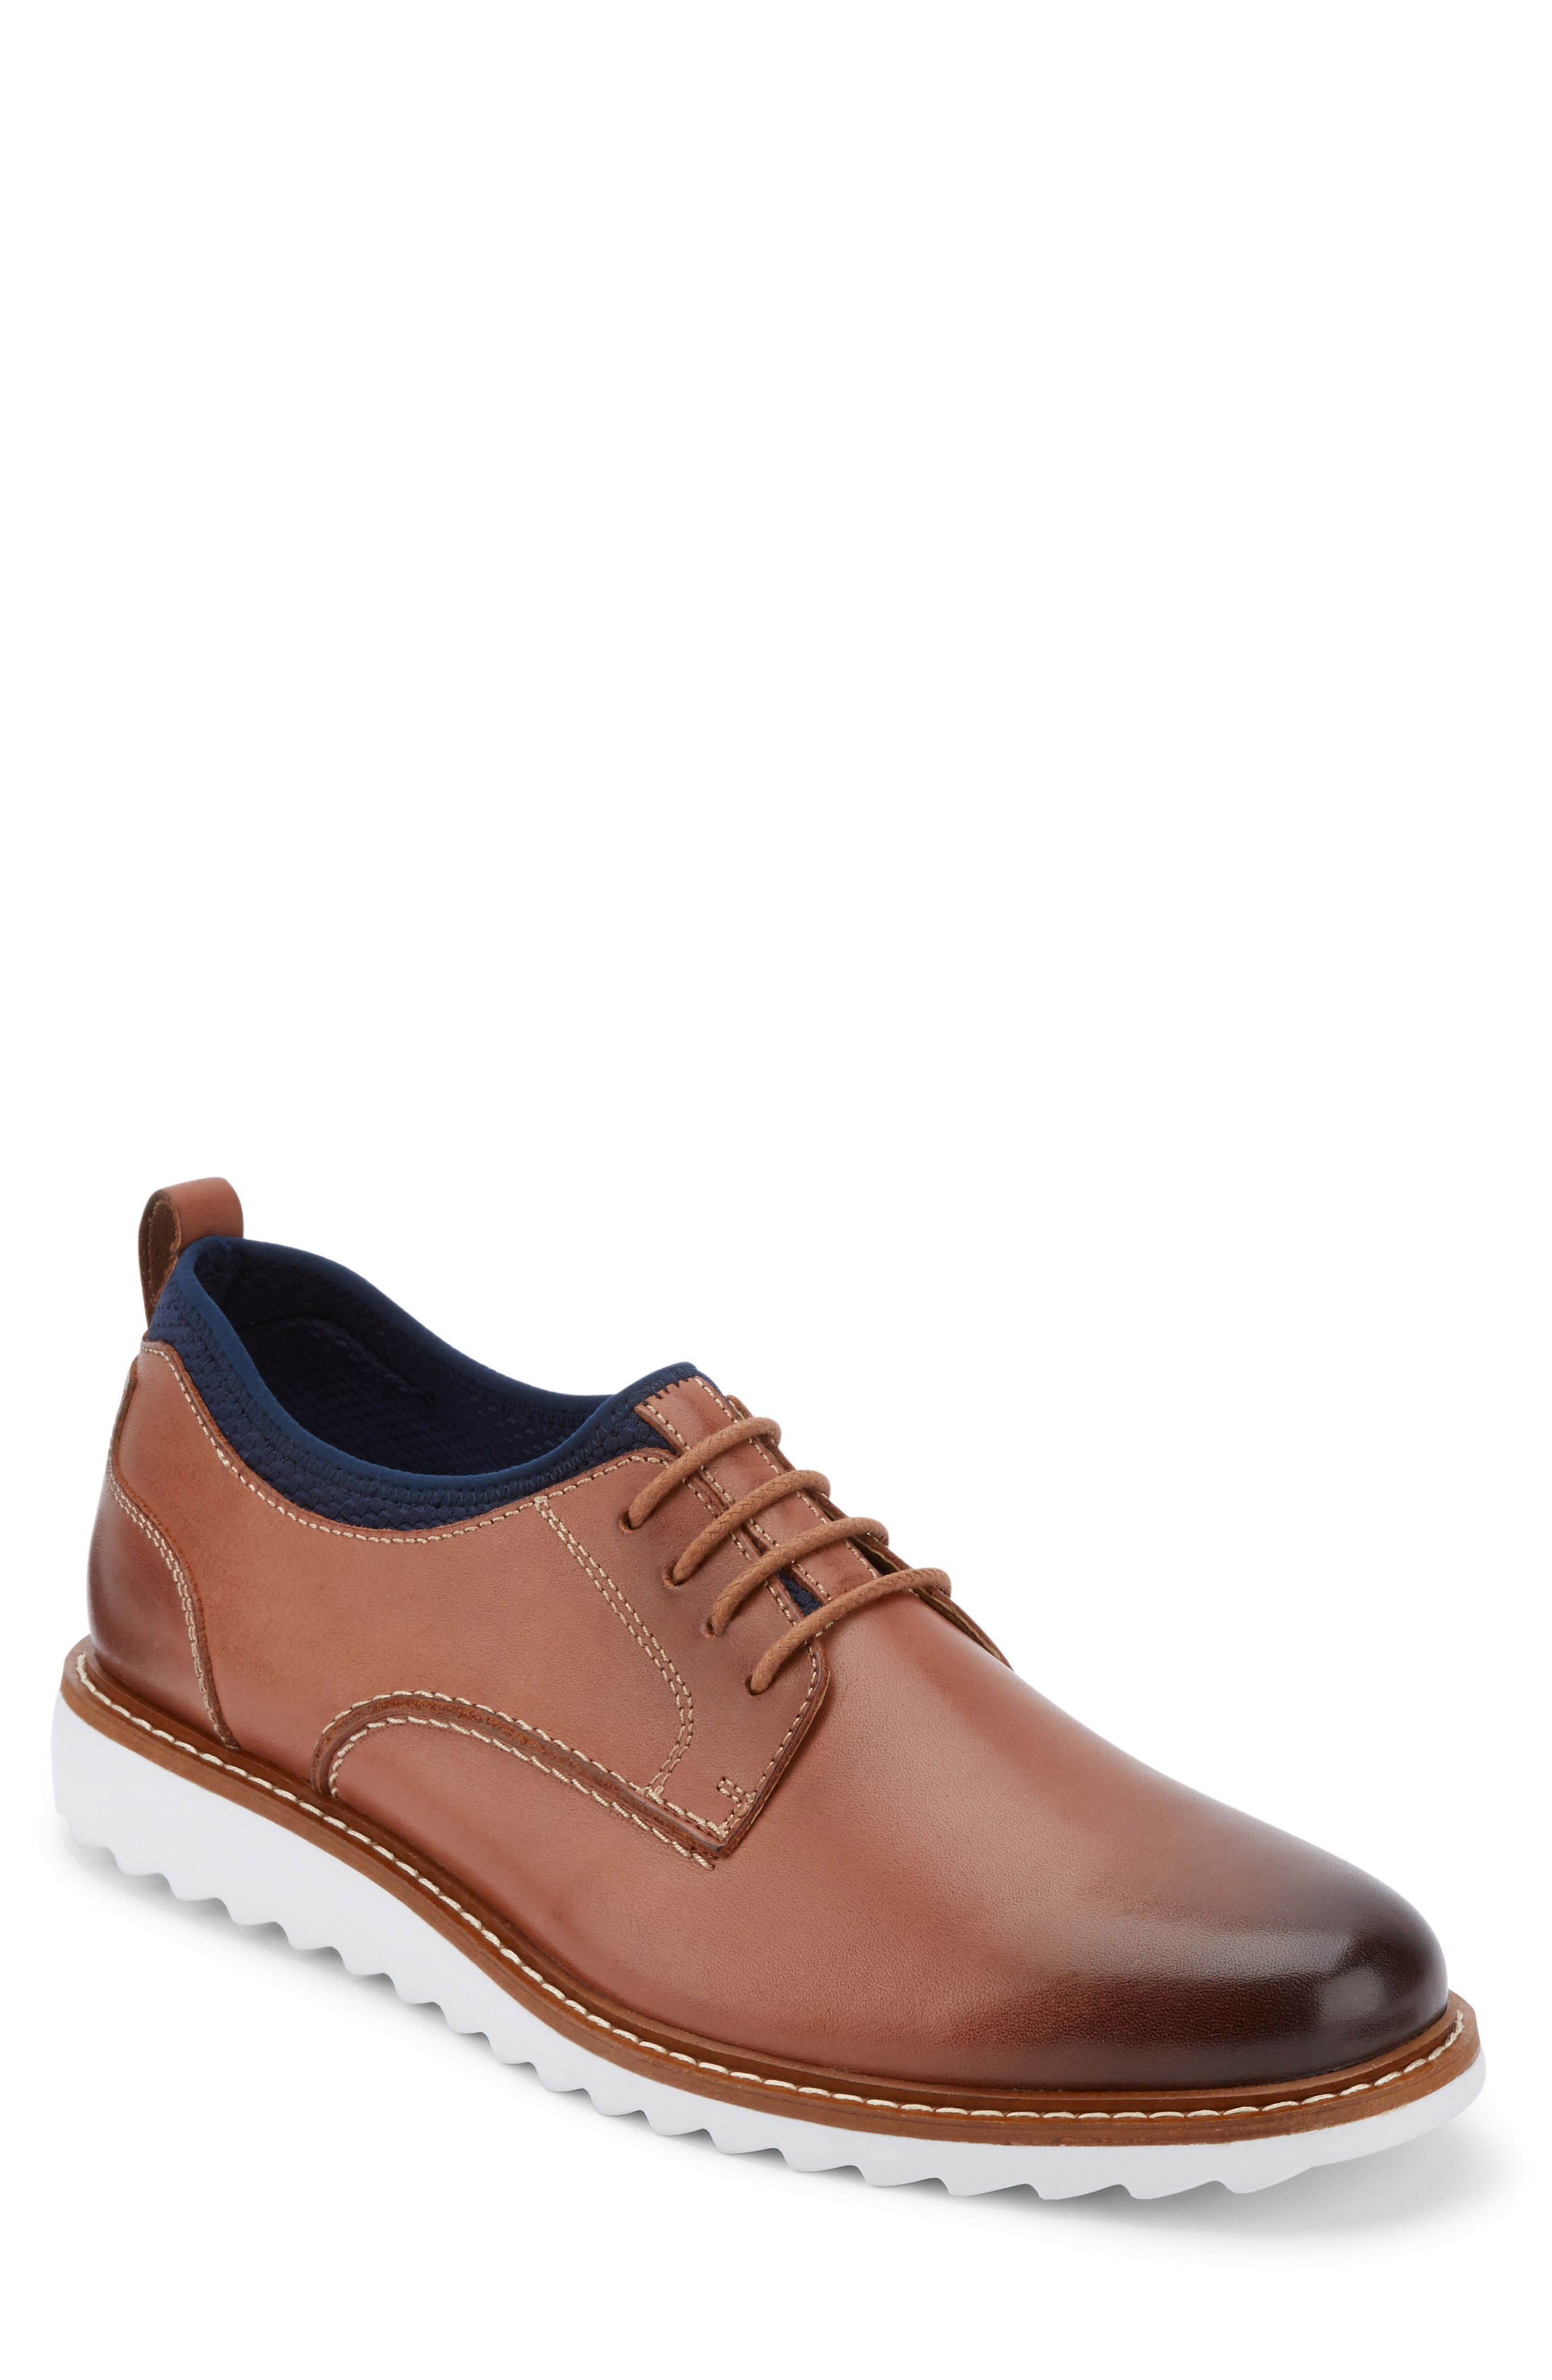 Buck 2.0 Plain Toe Derby,                             Main thumbnail 1, color,                             Tan Burnished Leather